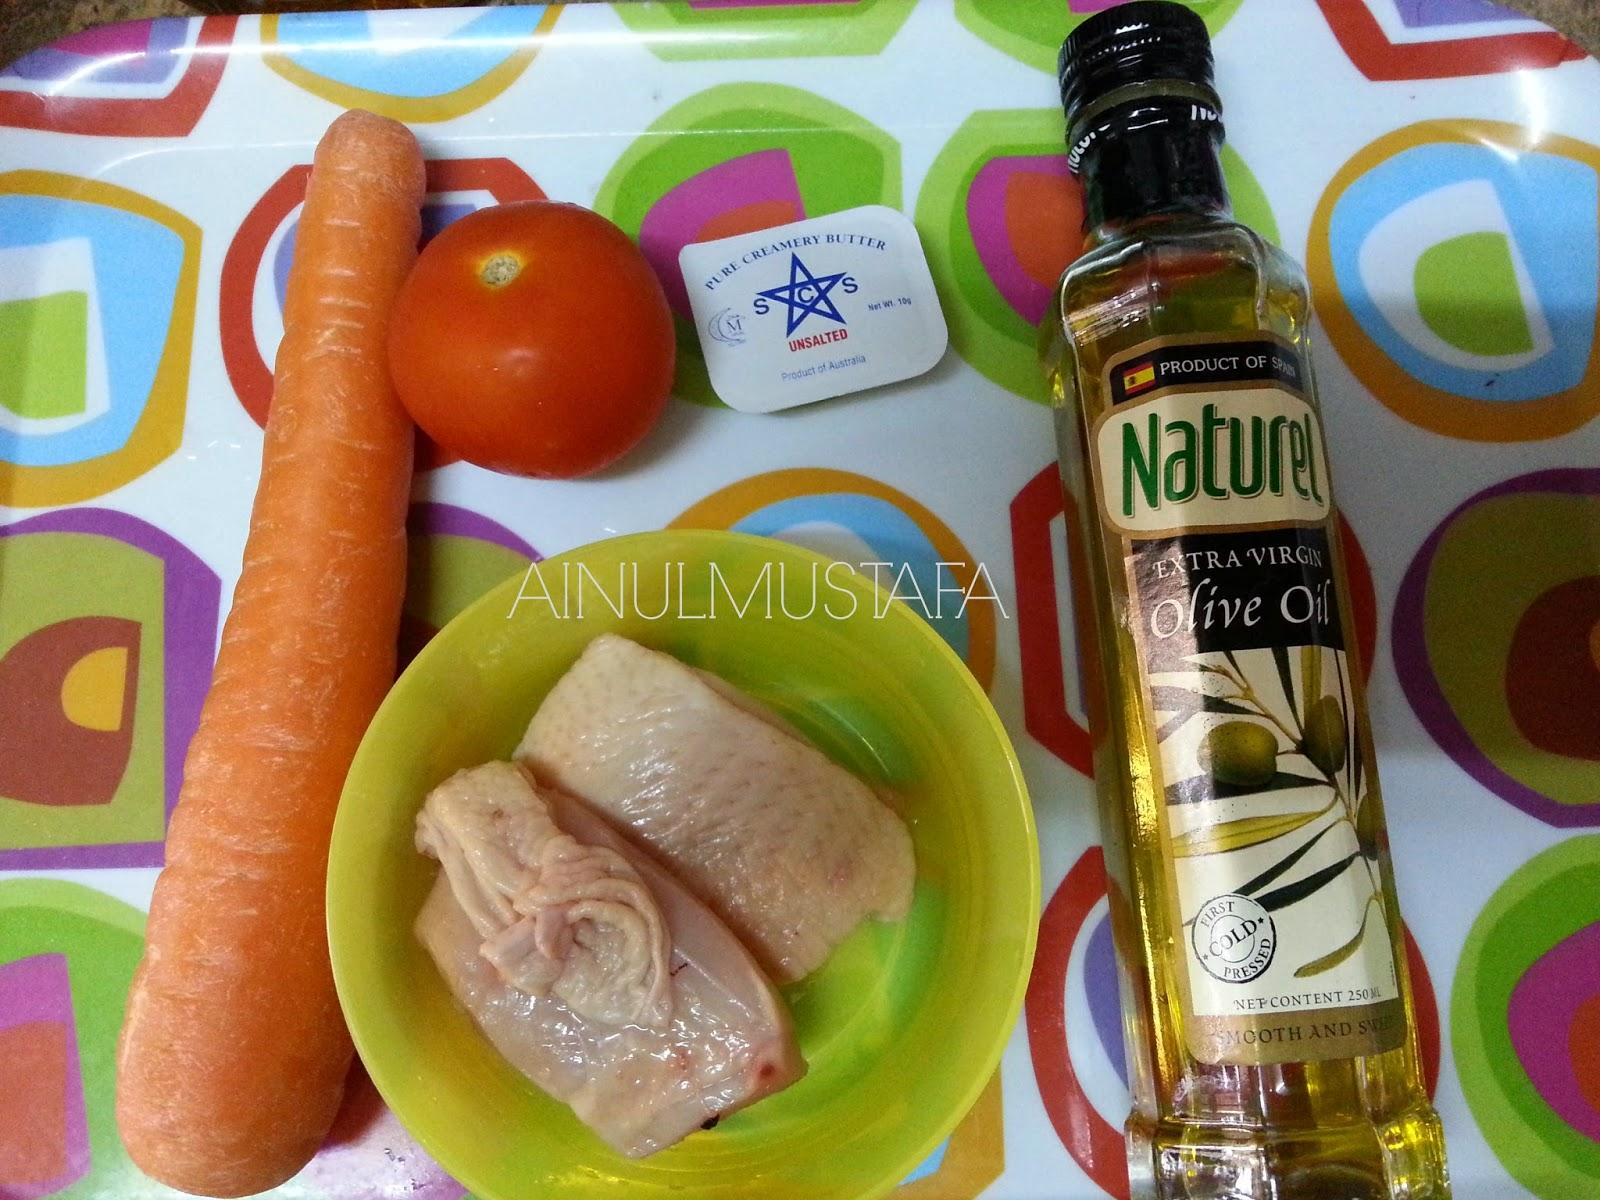 Resepi Sup Ayam Untuk Bayi 9 Bulan Yang Senang Dibuat Dan Sedap